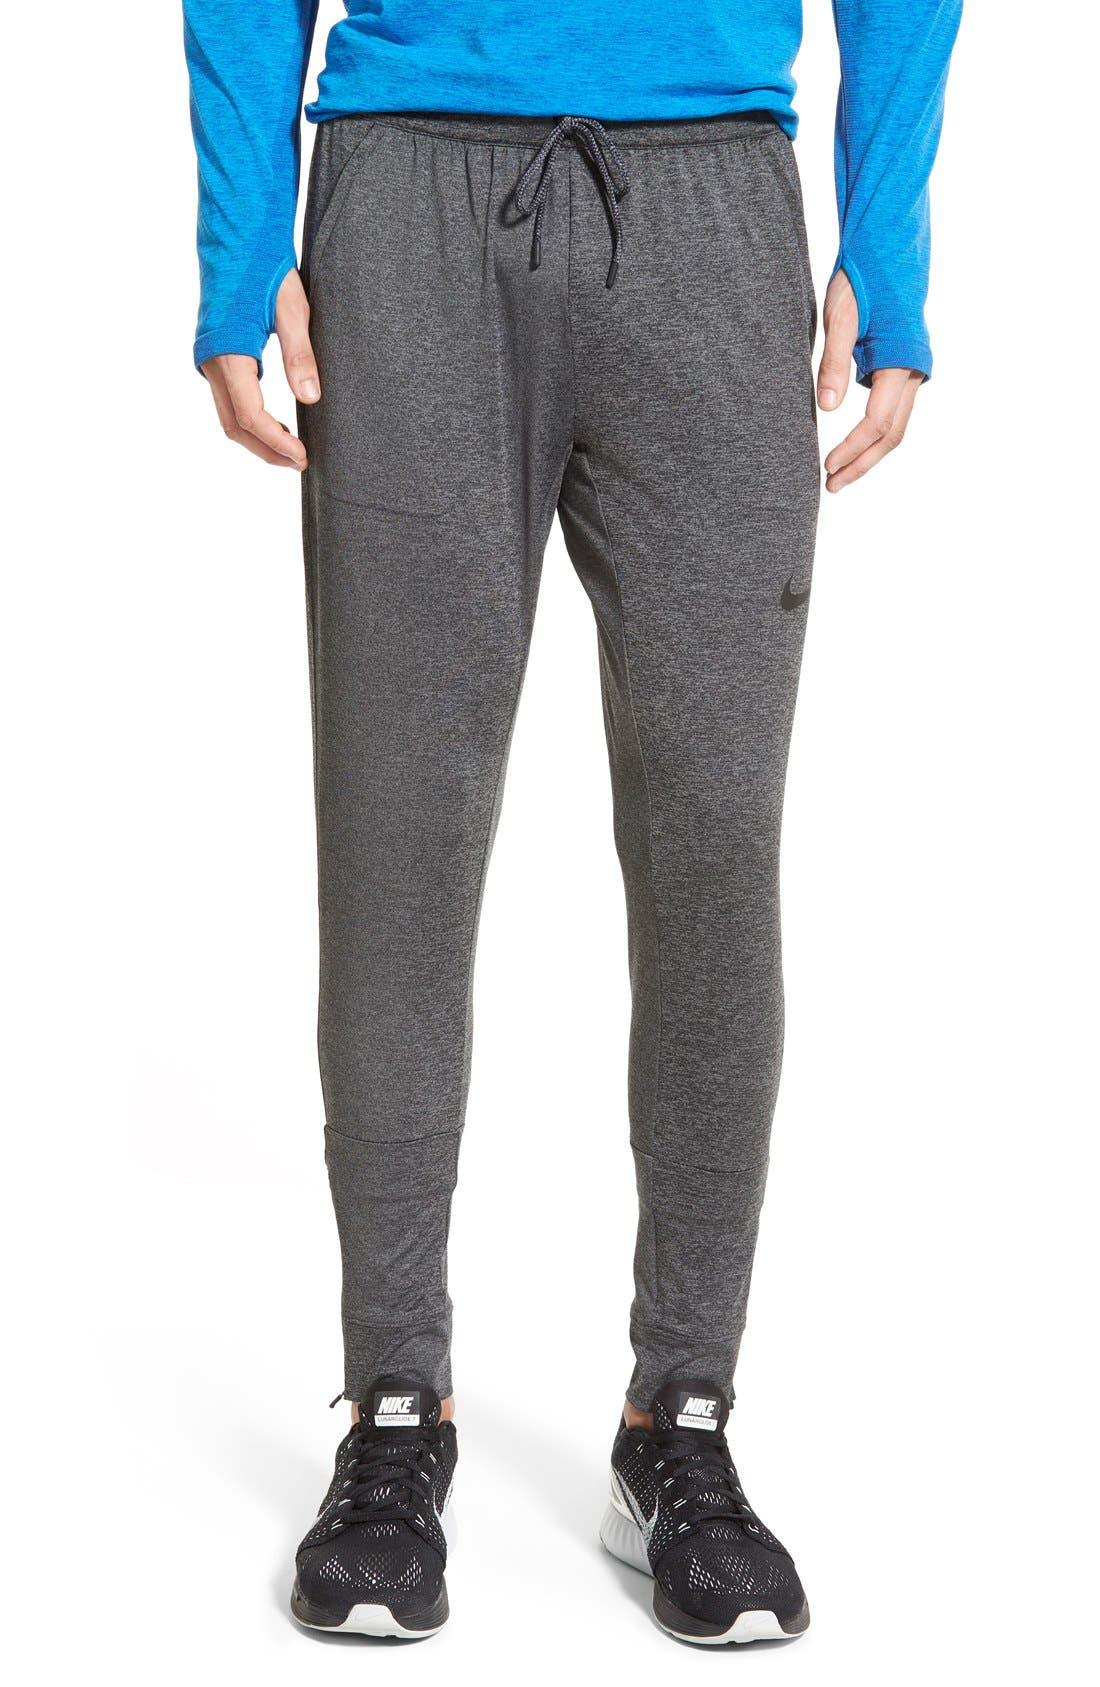 NIKE 'Ultimate Dry Knit' Dri-FIT Training Pants, Main, color, 010